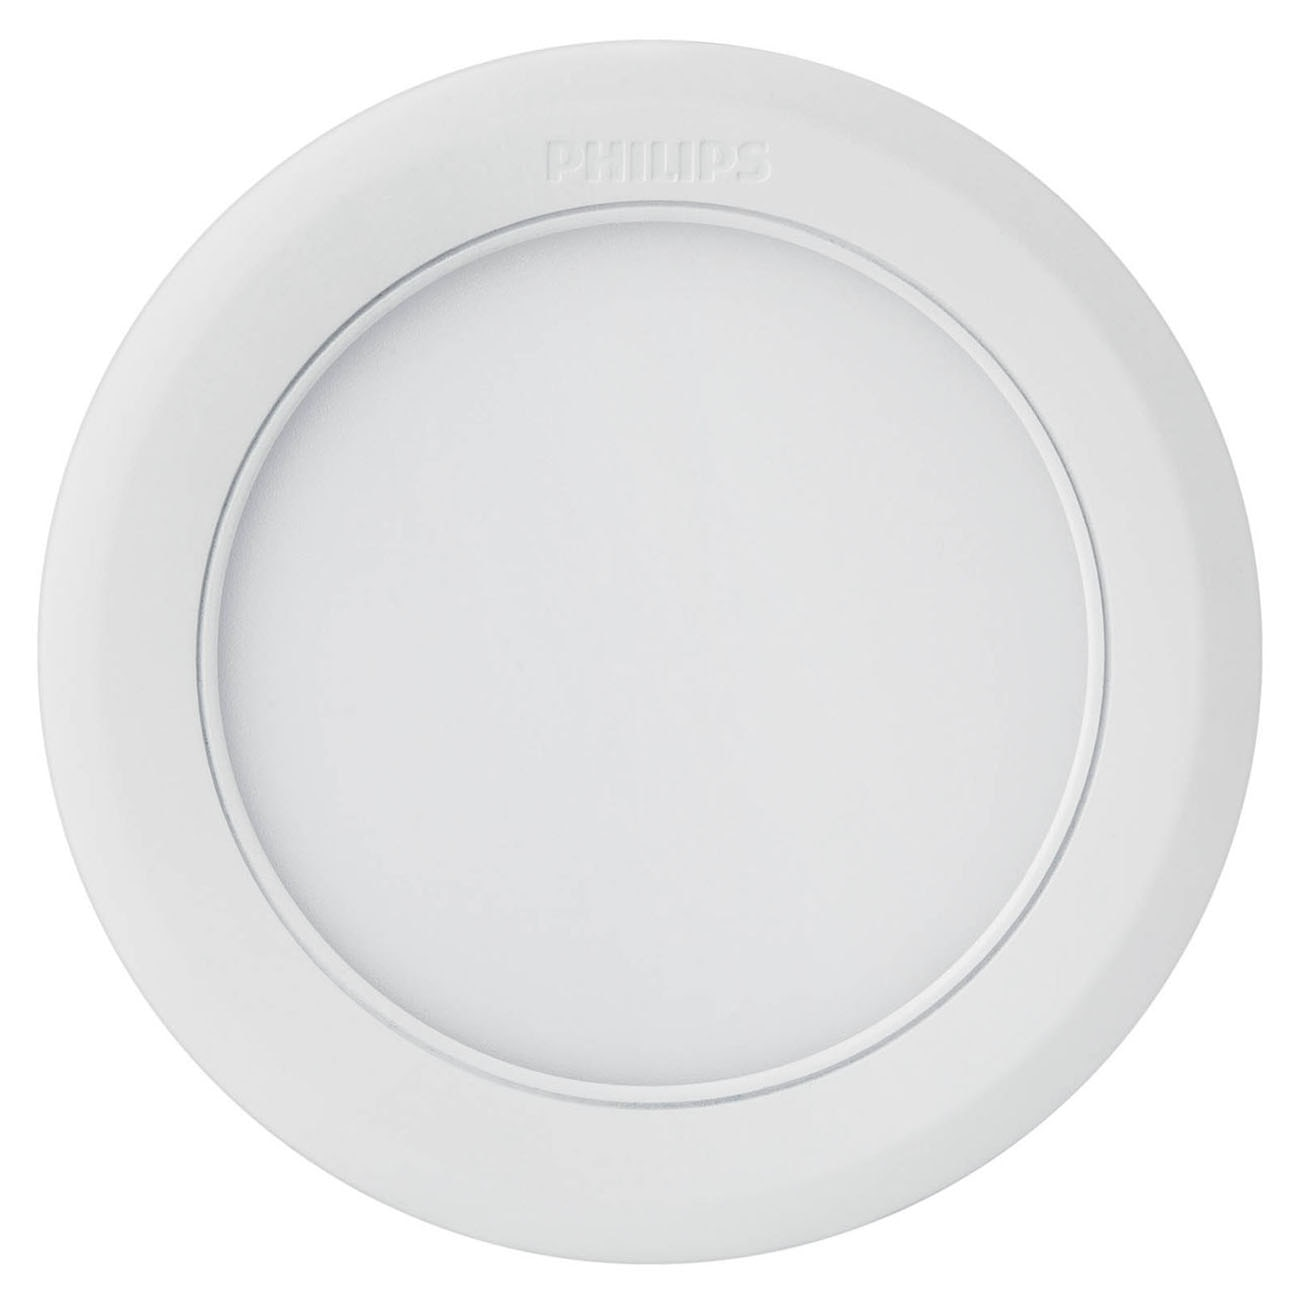 Fotografie Spot LED incastrat Philips Marcasite, 14W (92W), 1370 lm, lumina alba rece